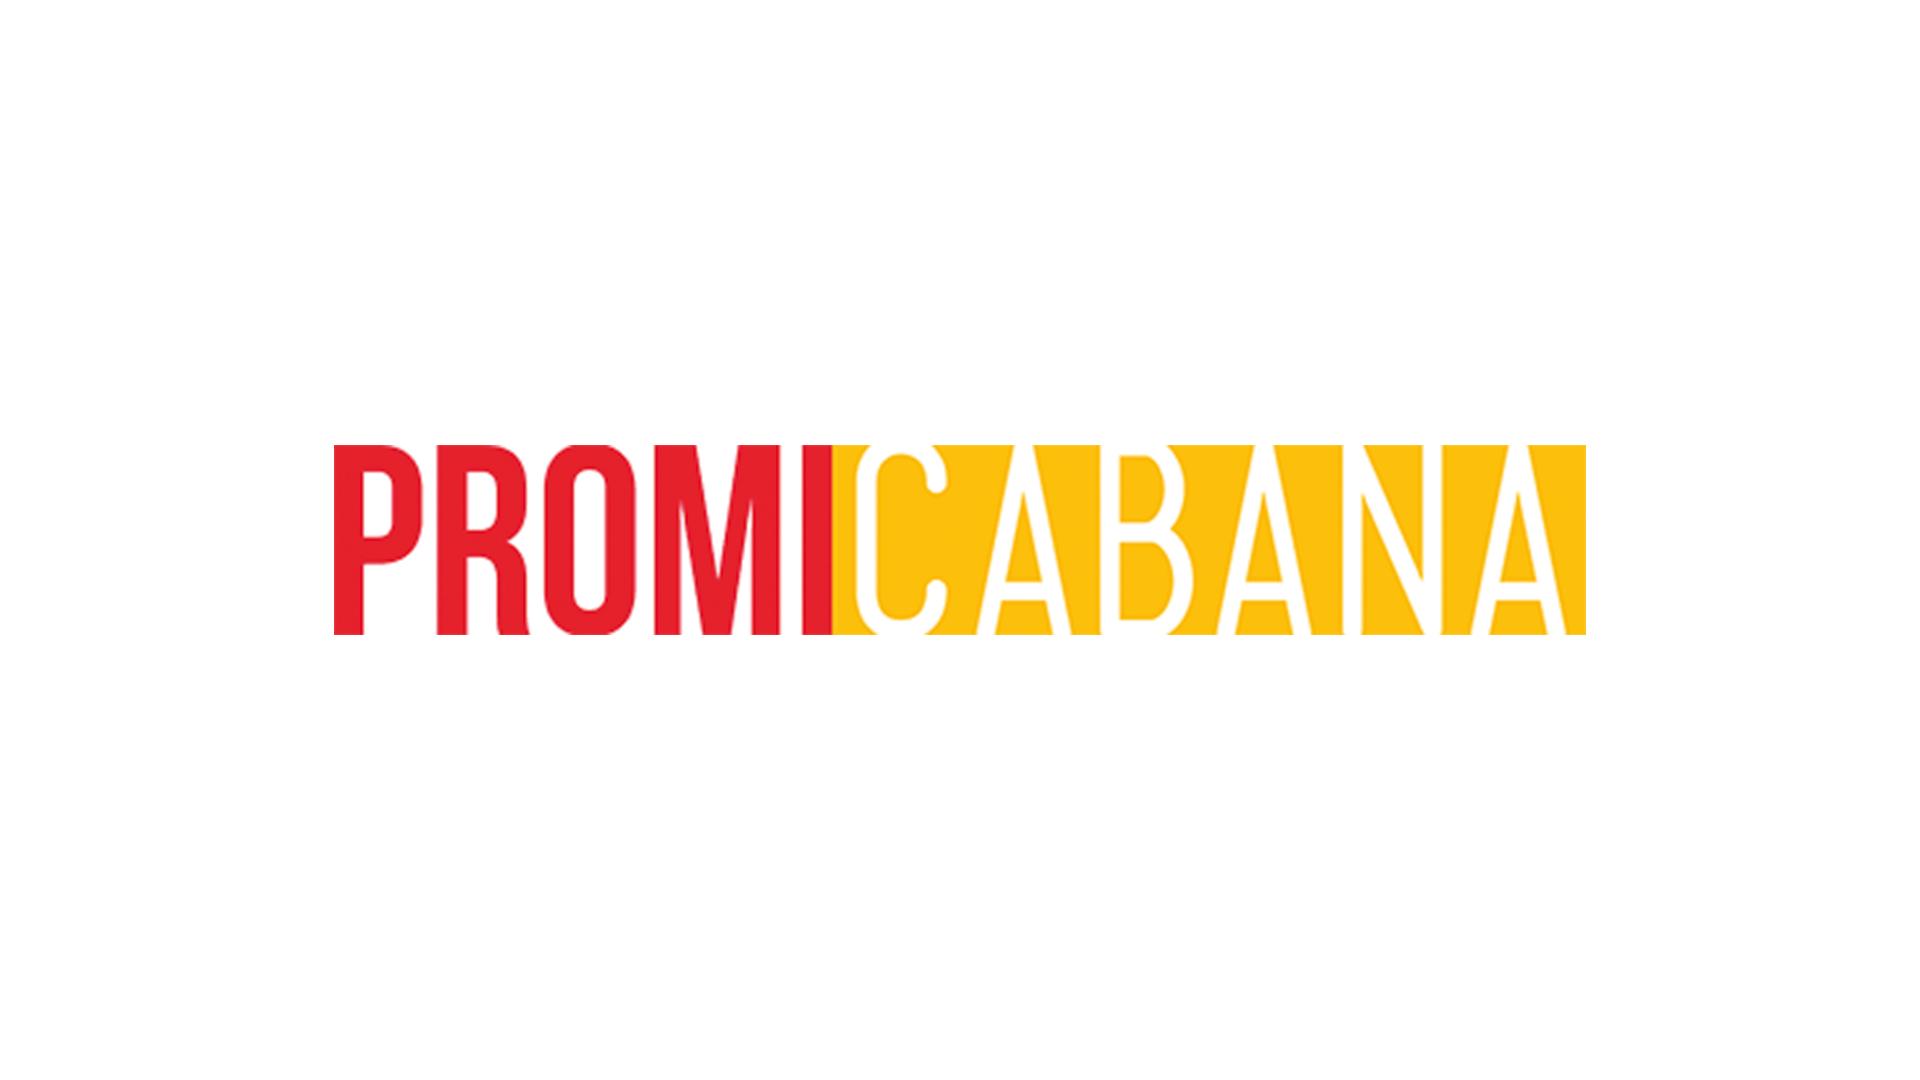 King-Arthur-Legend-of-the-Sword-Charlie-Hunnam-Trailer